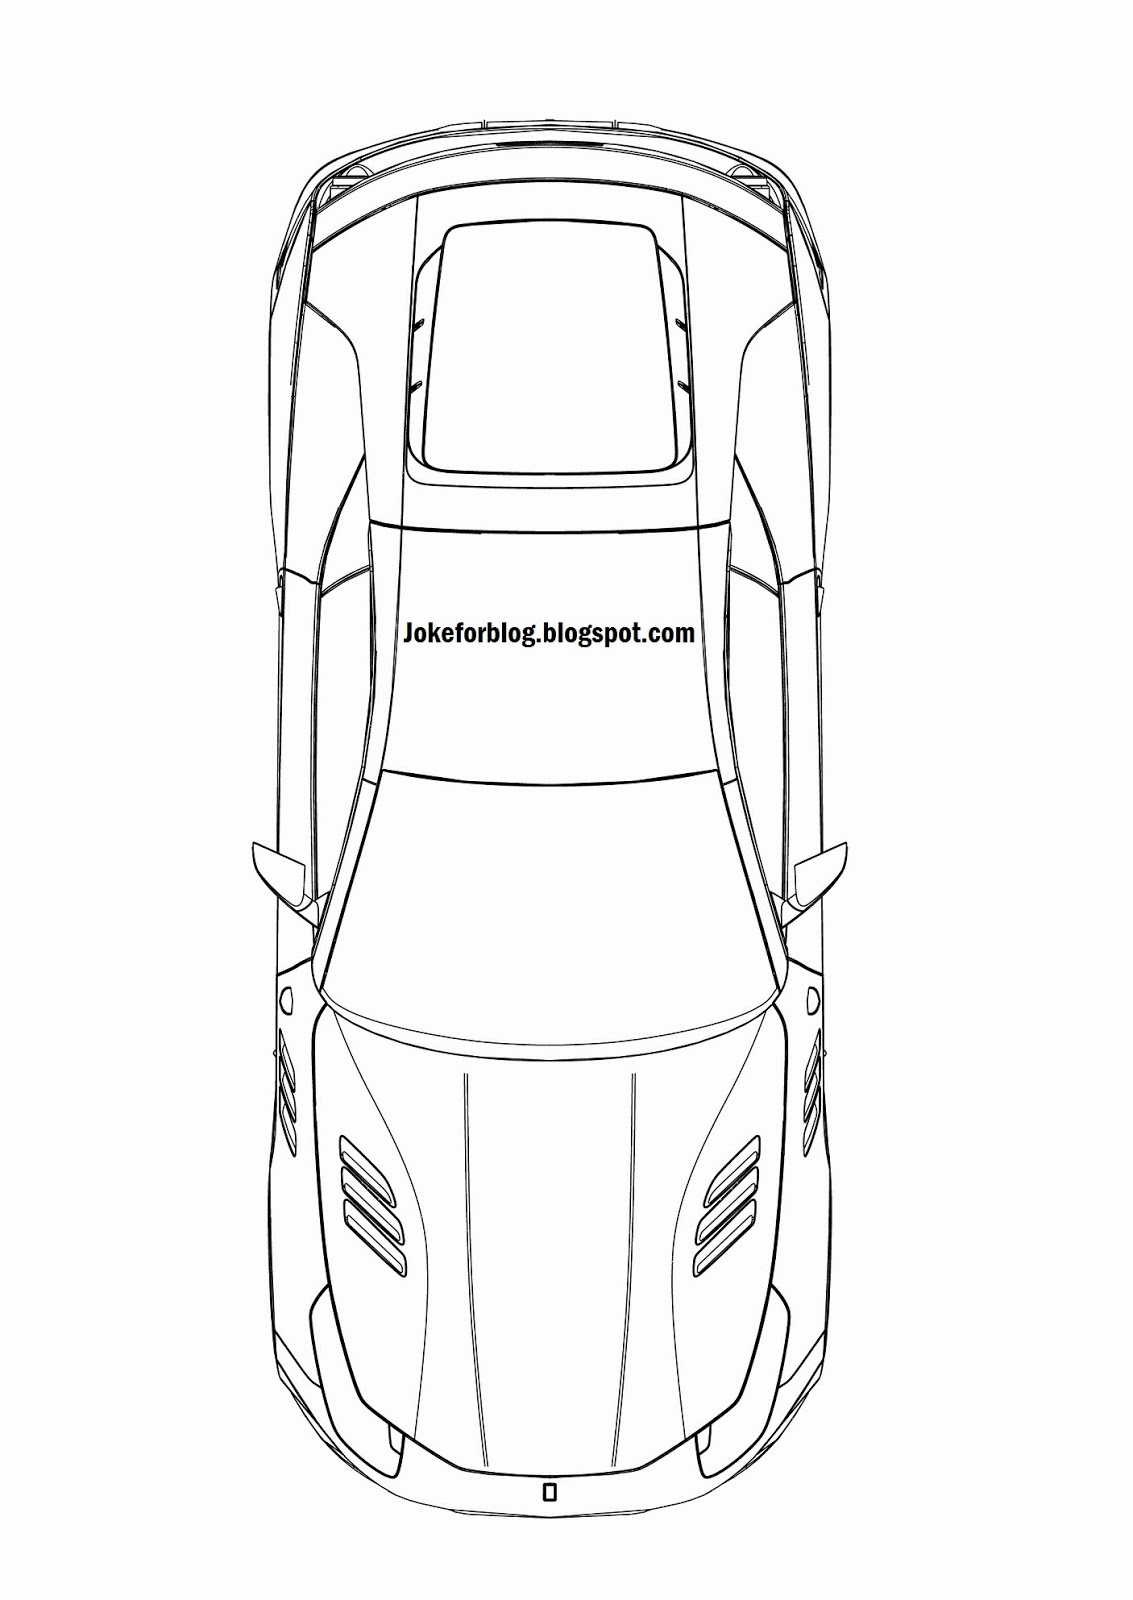 Jokeforblog Ferrari Ff 2 Seats From Euro Patent Register